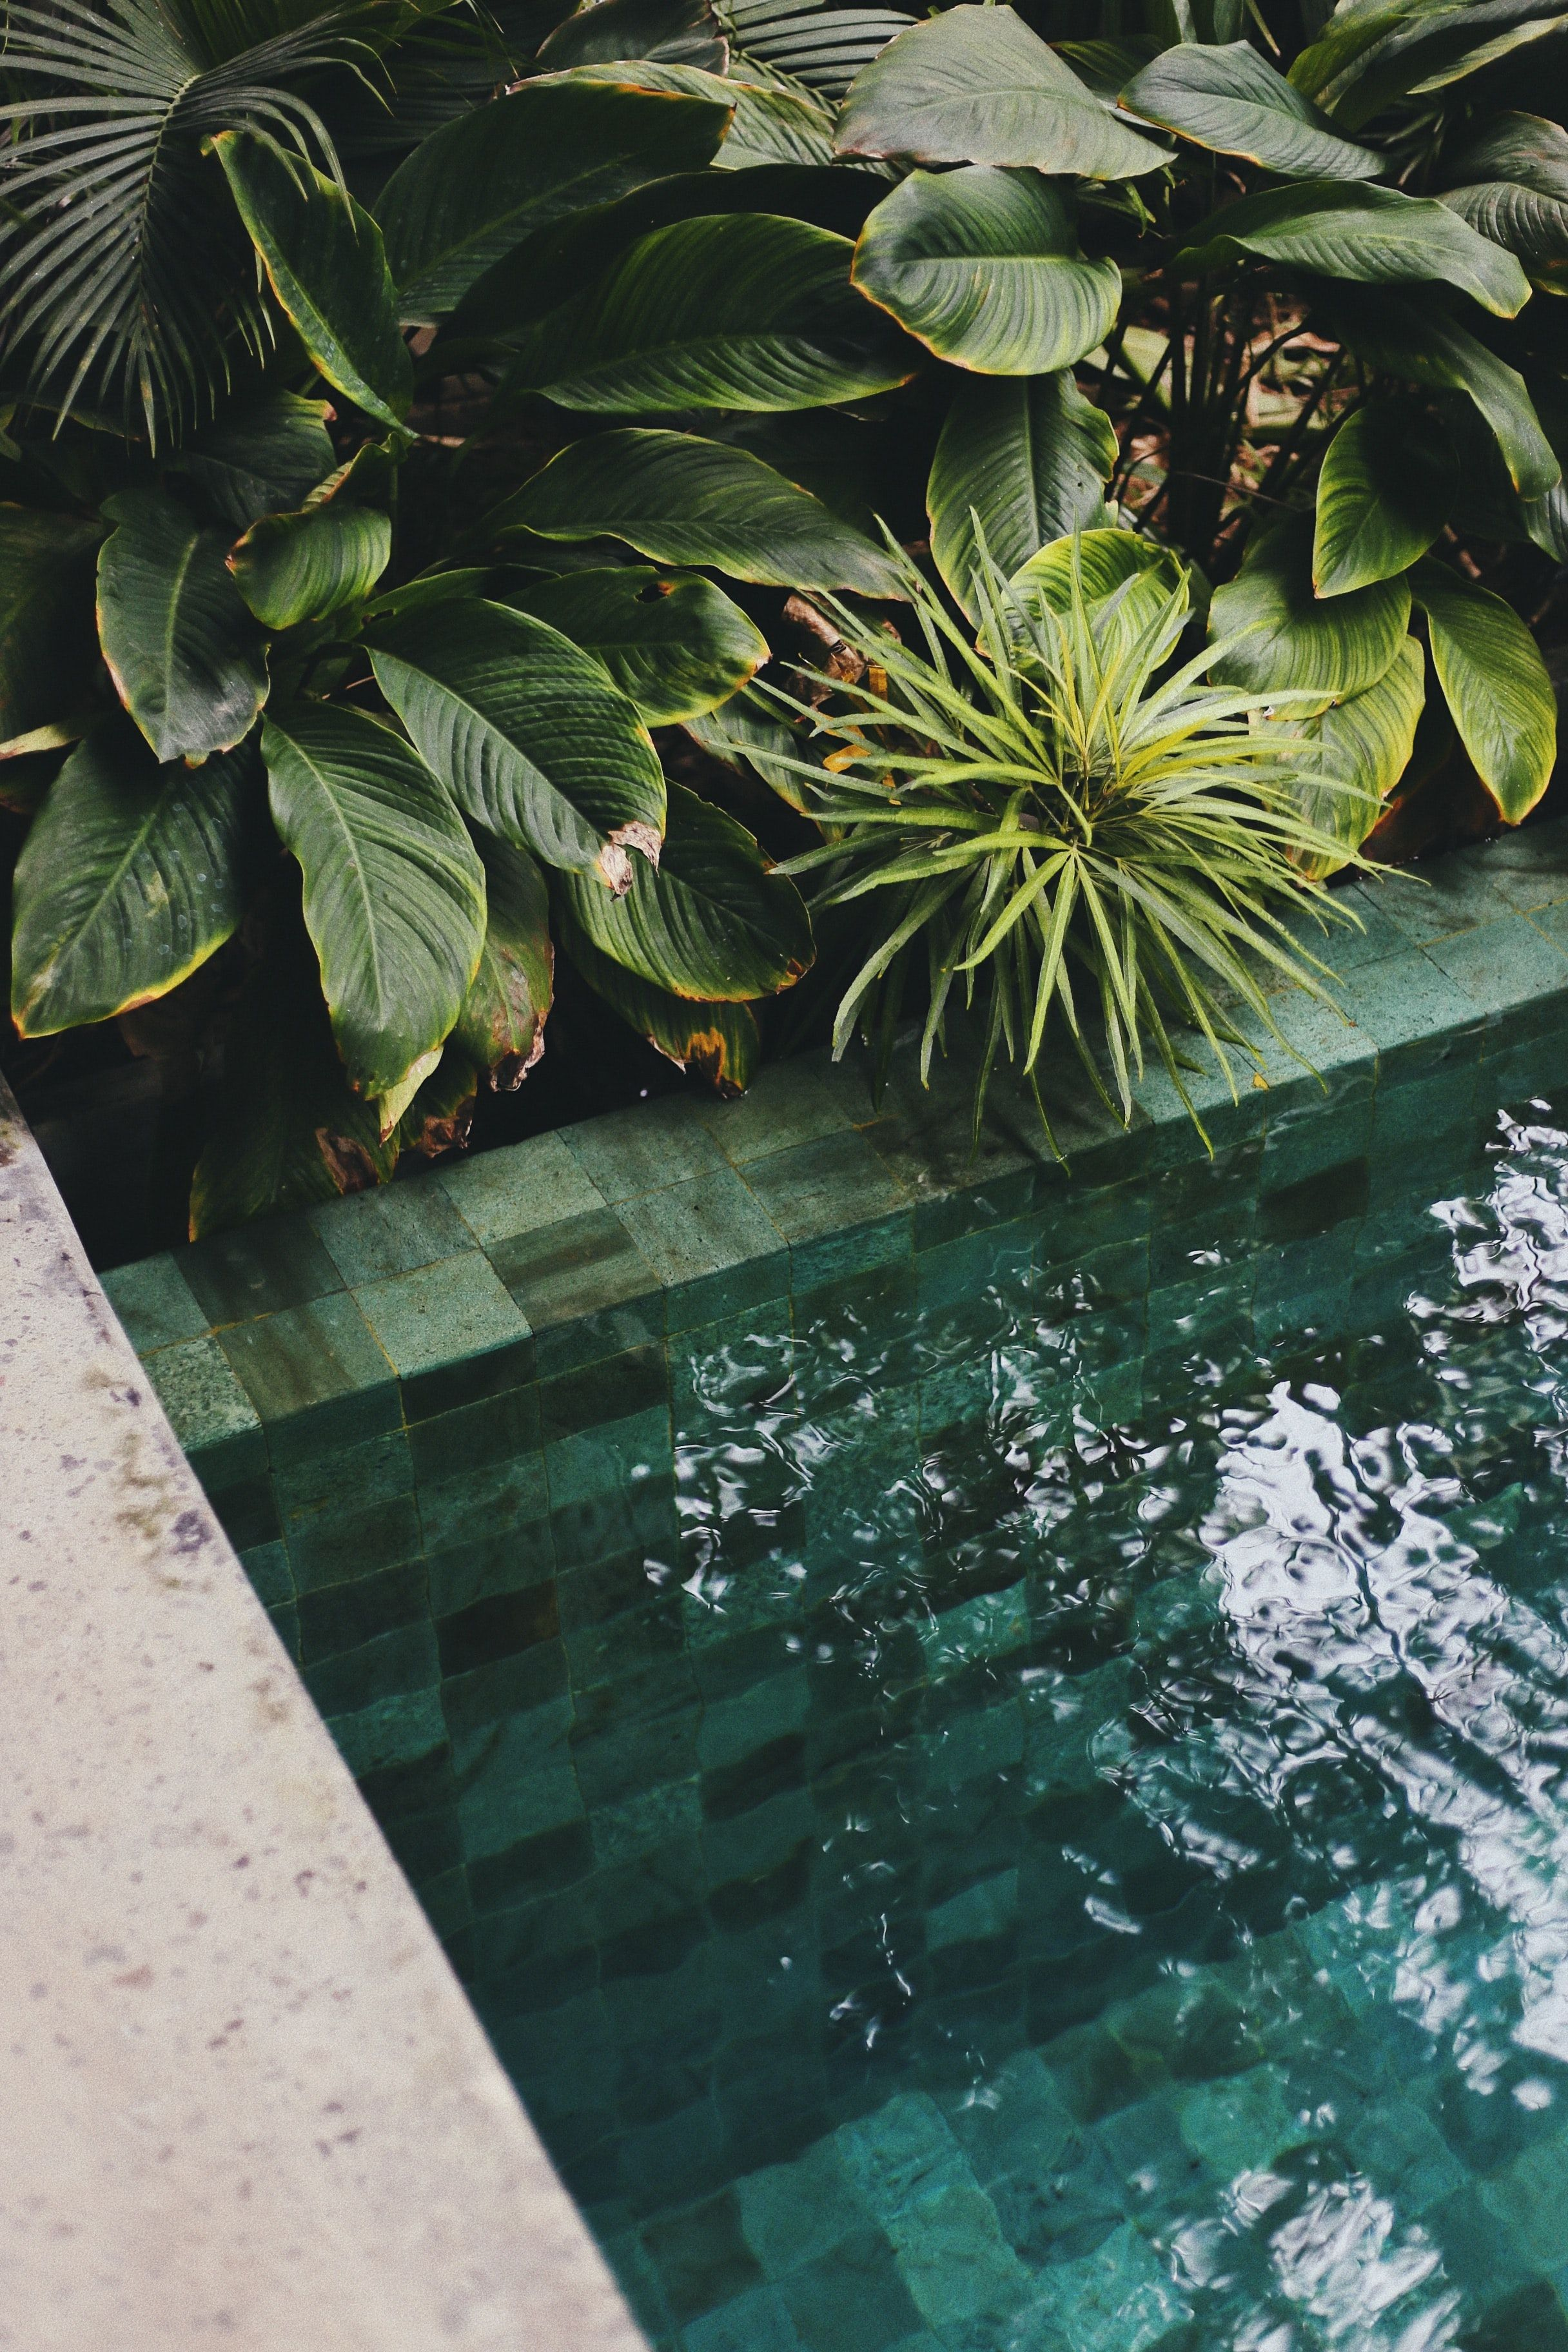 greenleafed plant (с изображениями) Растения, Бали